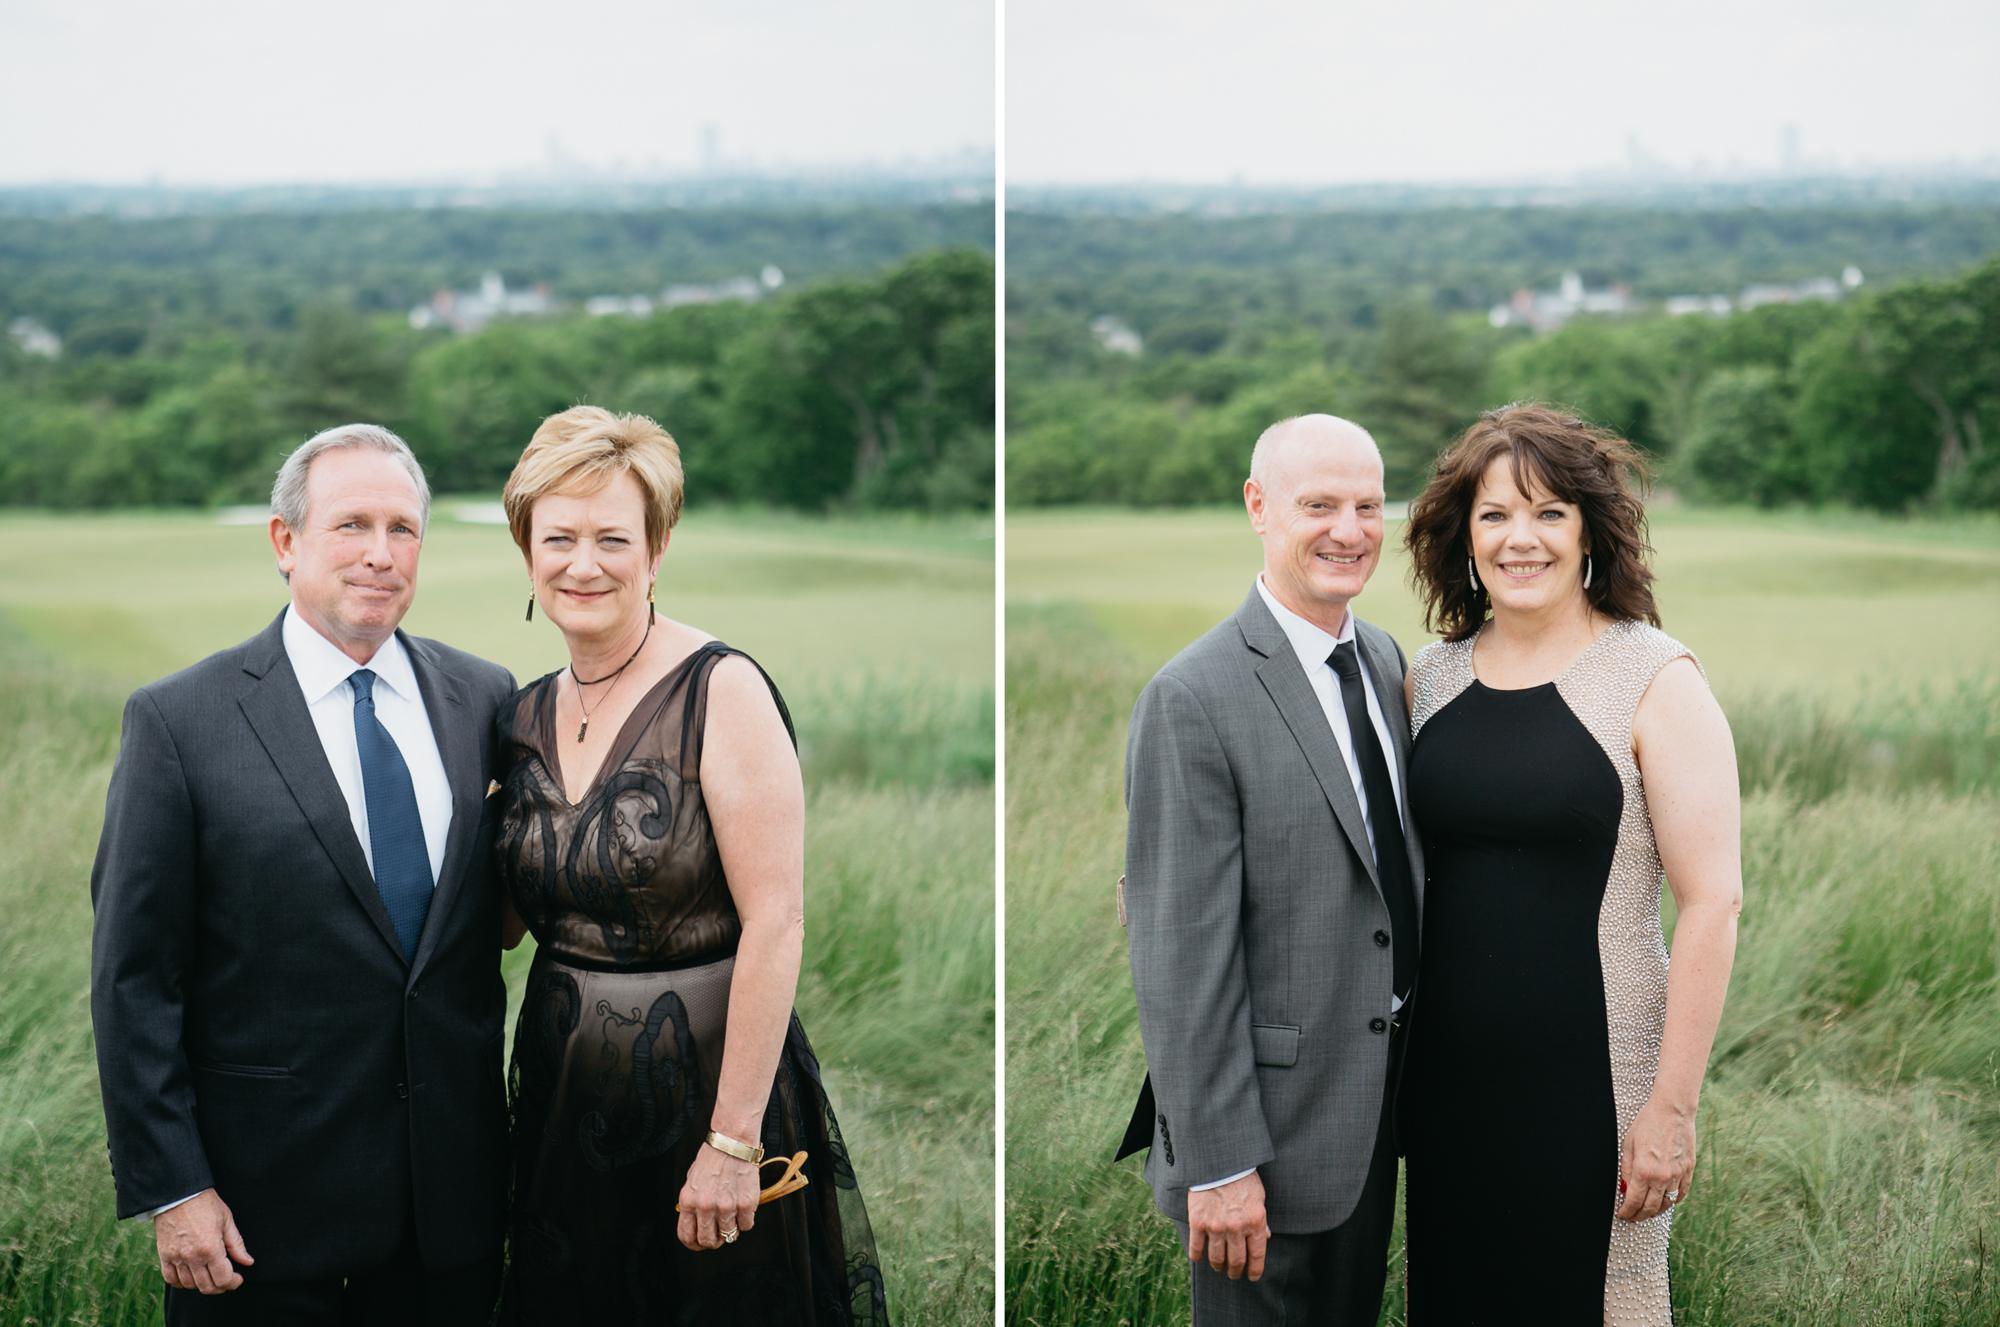 Jaclyn_Andrew_quincy_massachusetts_wedding010.jpg